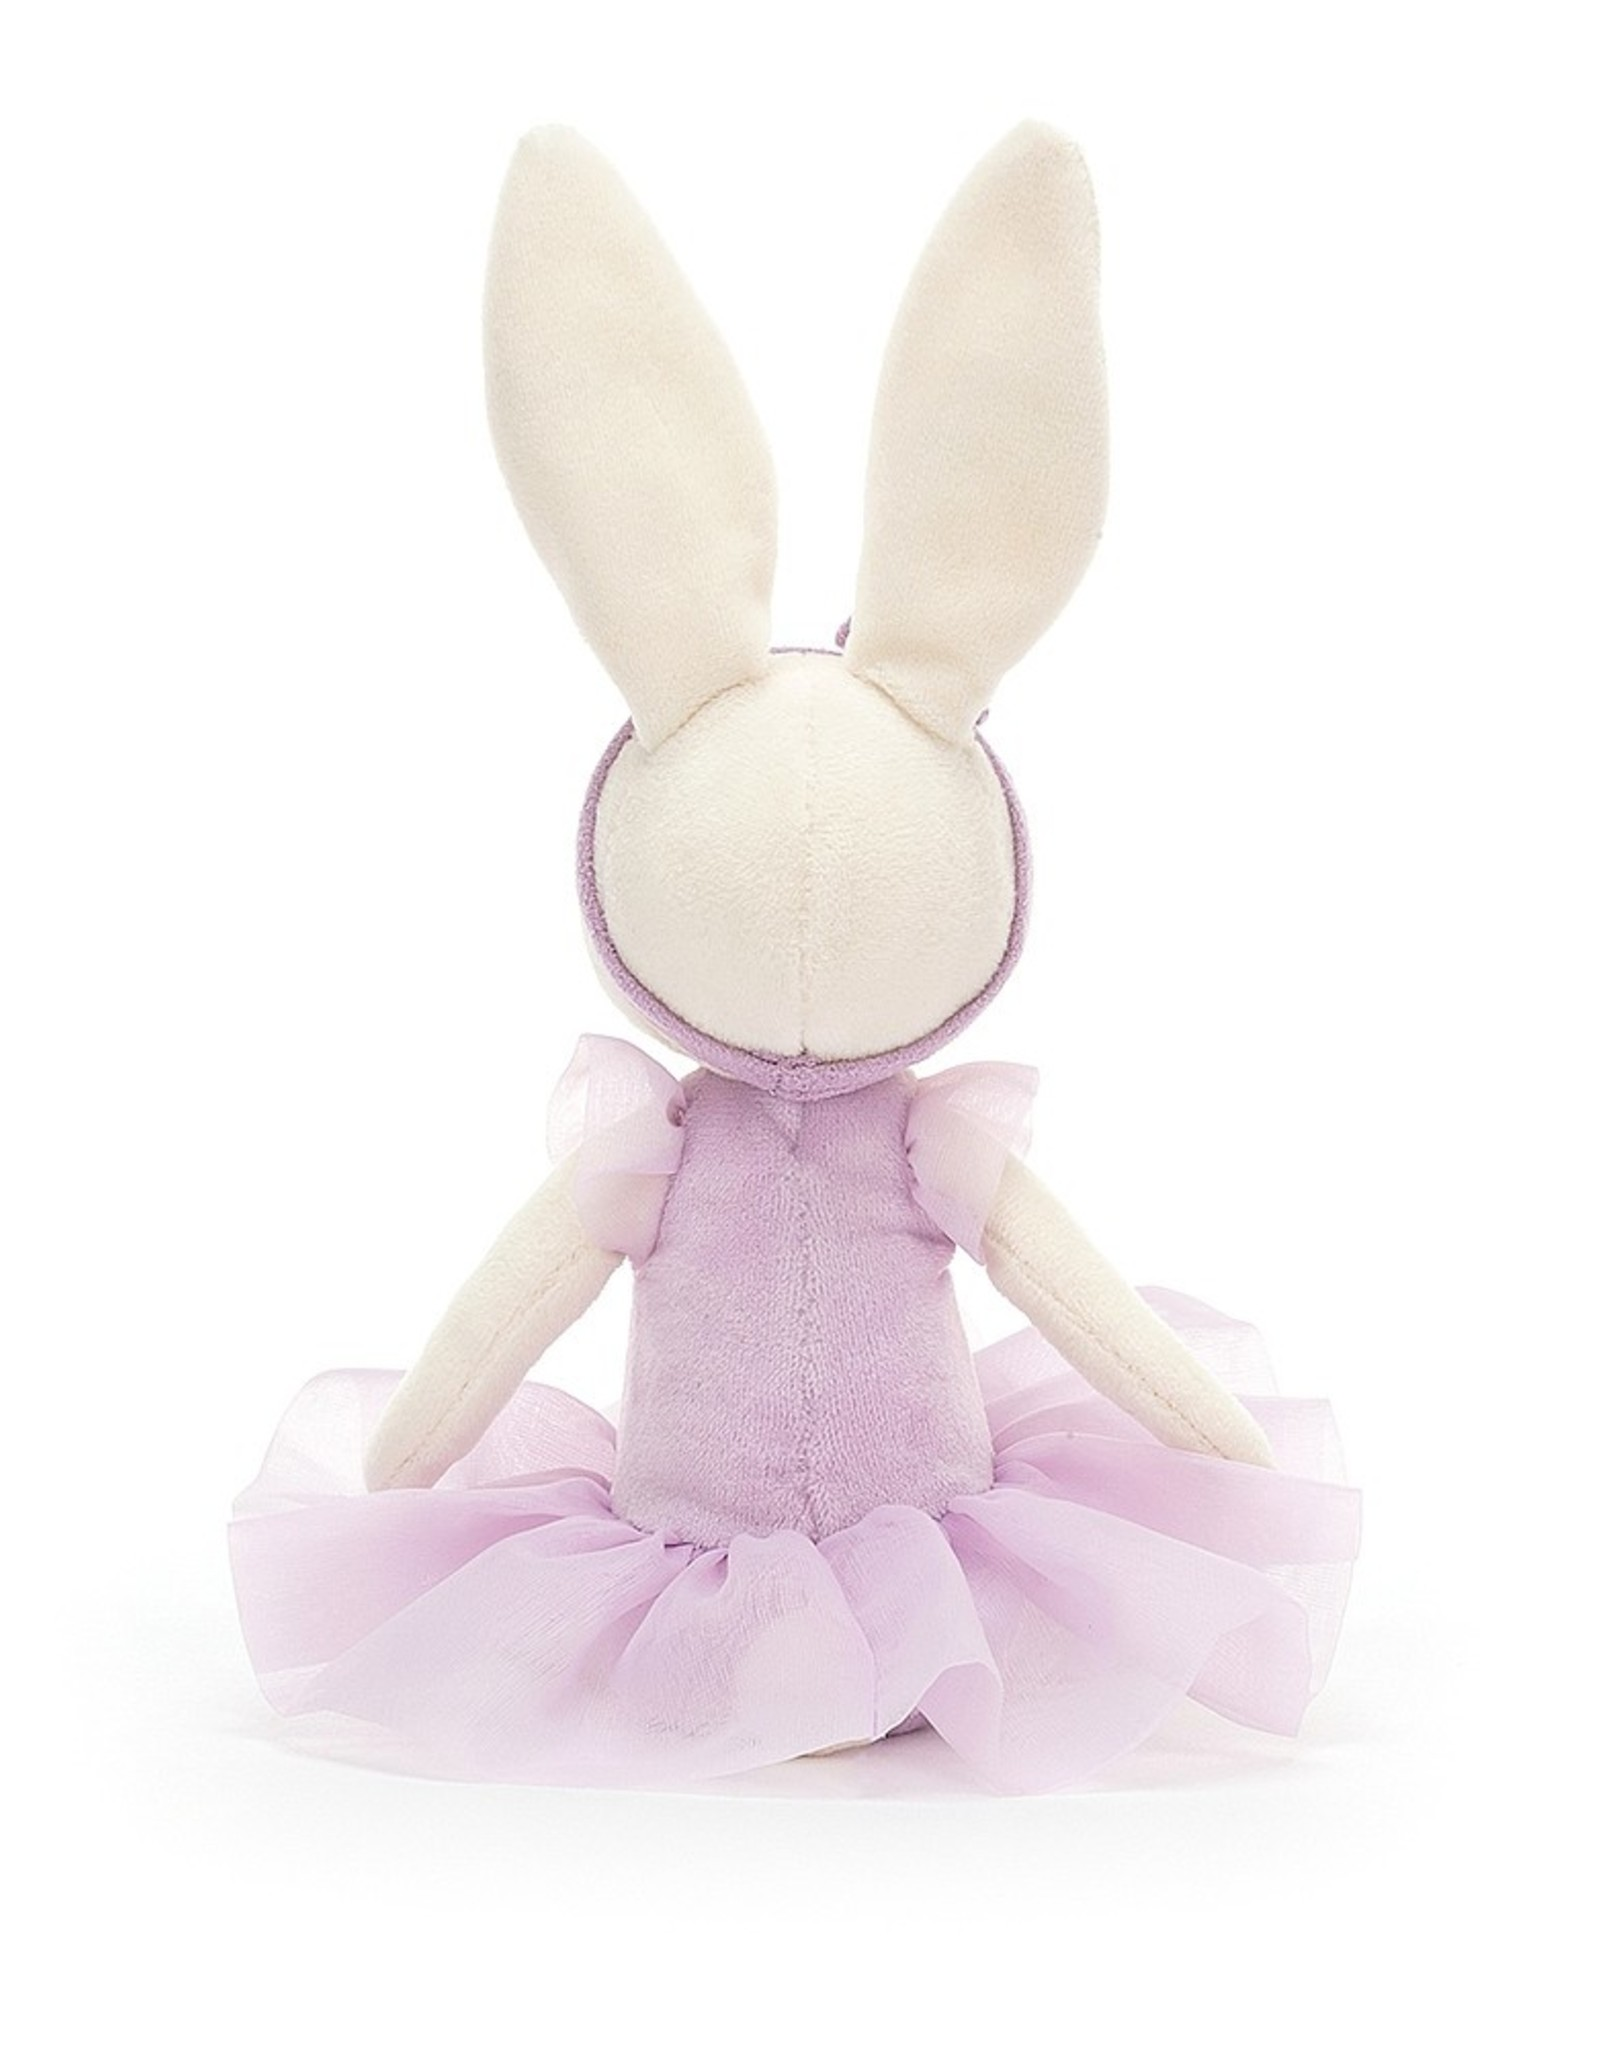 Jellycat Jellycat Pirouette Bunny - Lilac